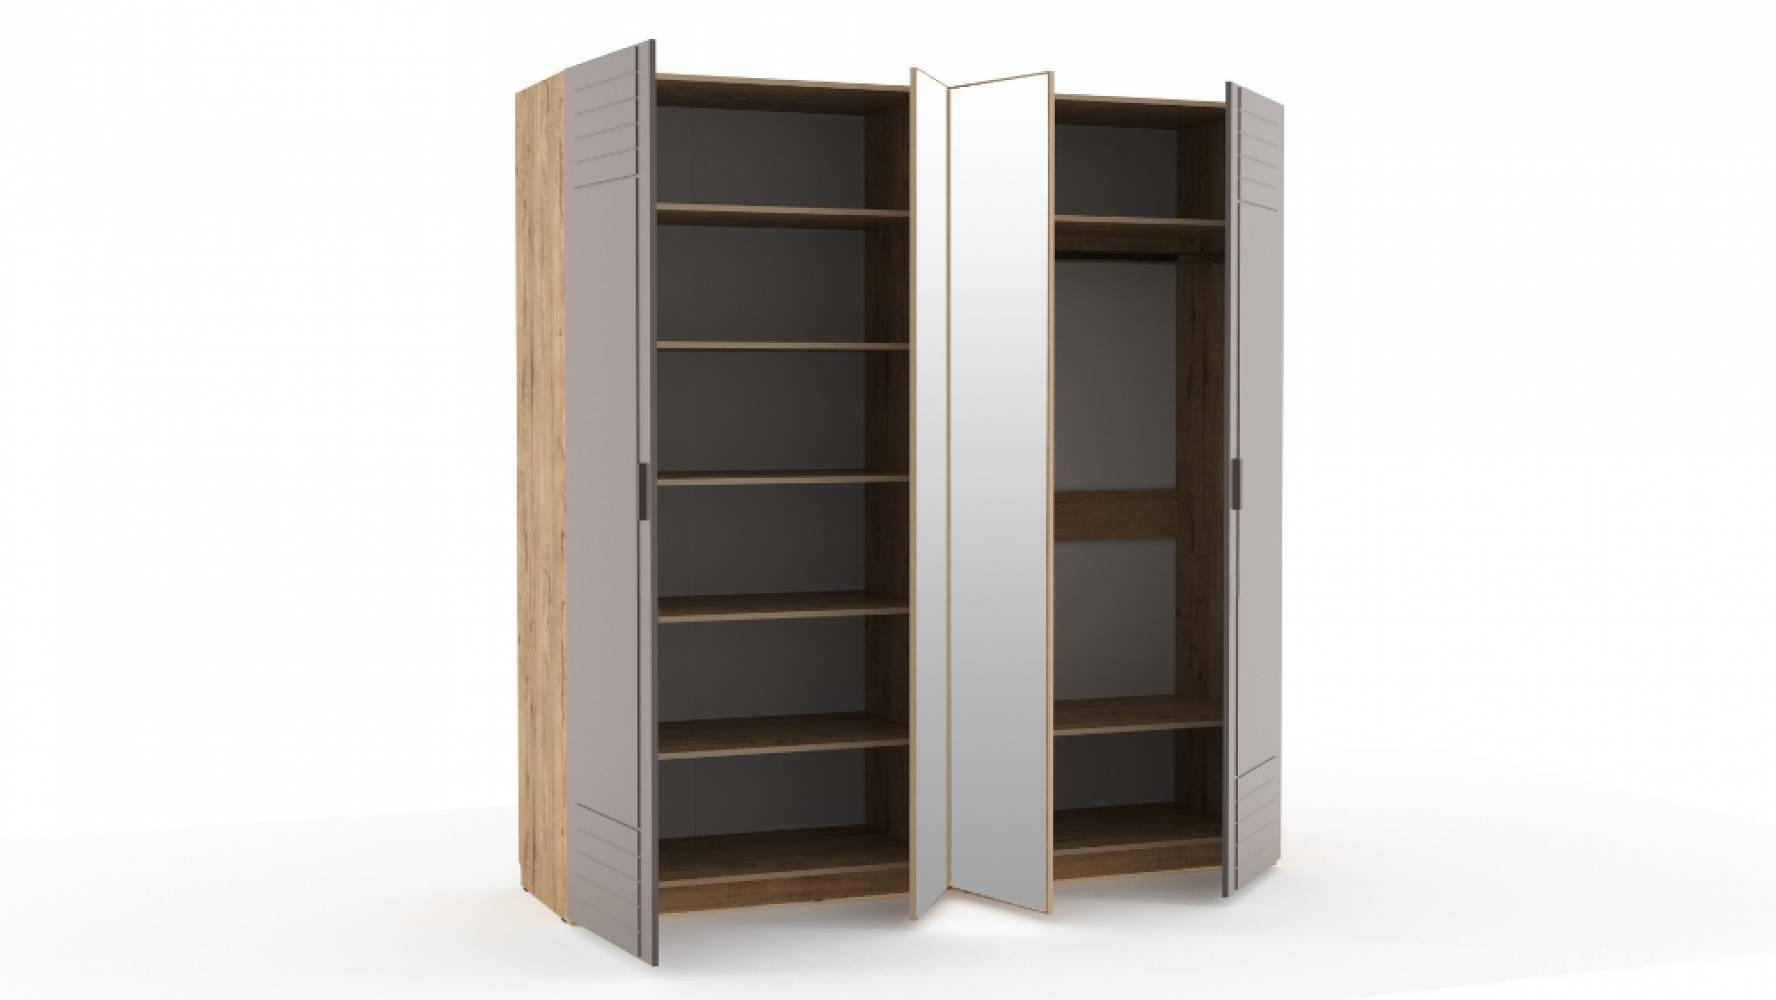 Шкаф комбинированный НМ 013.58 LIVORNO (Дуб Бунратти/Софт Графит)